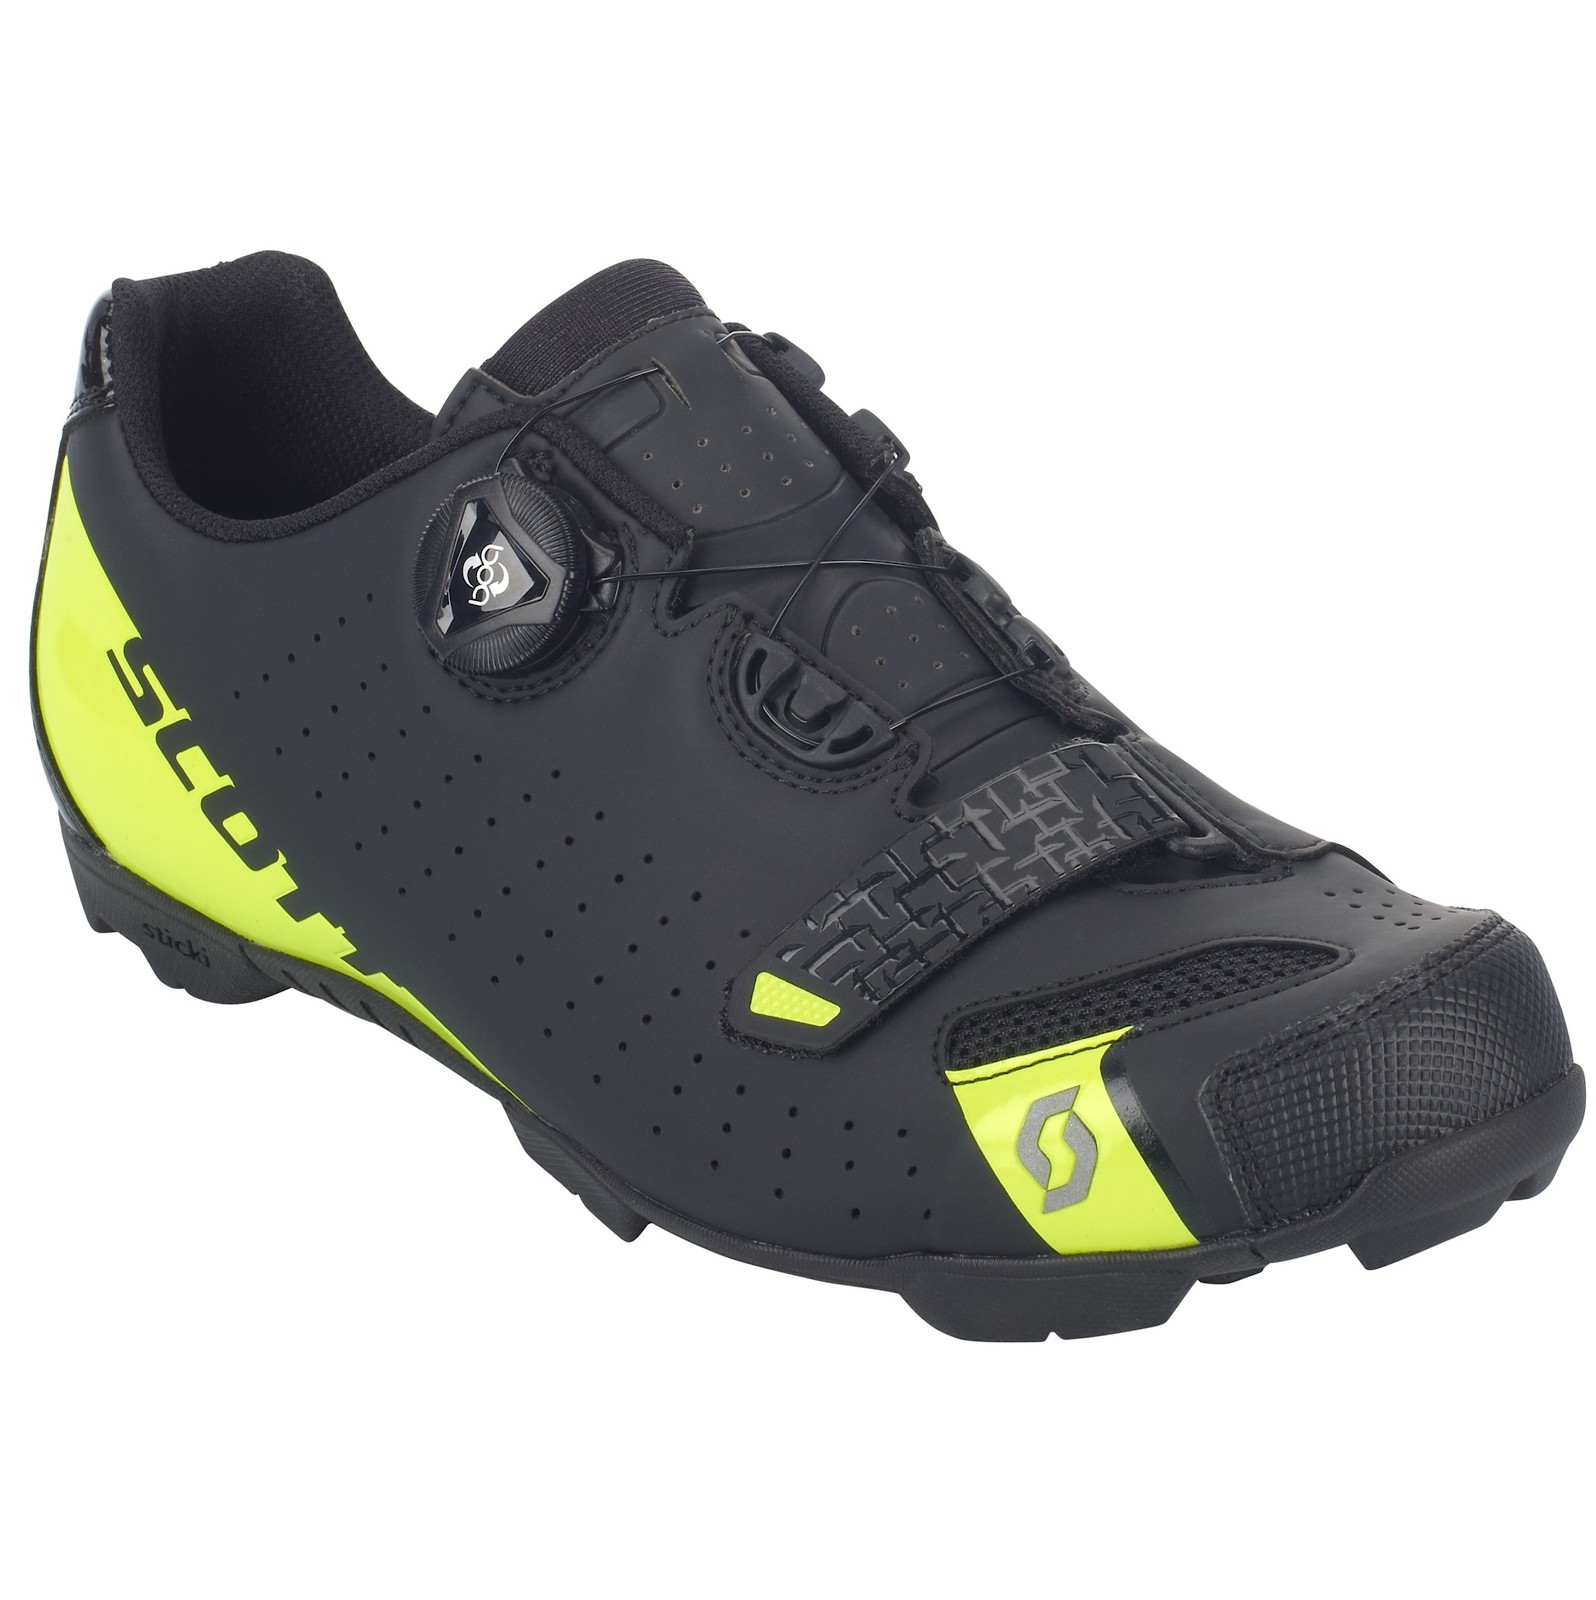 Scott Future Pro shoe in matte black/sulphur yellow